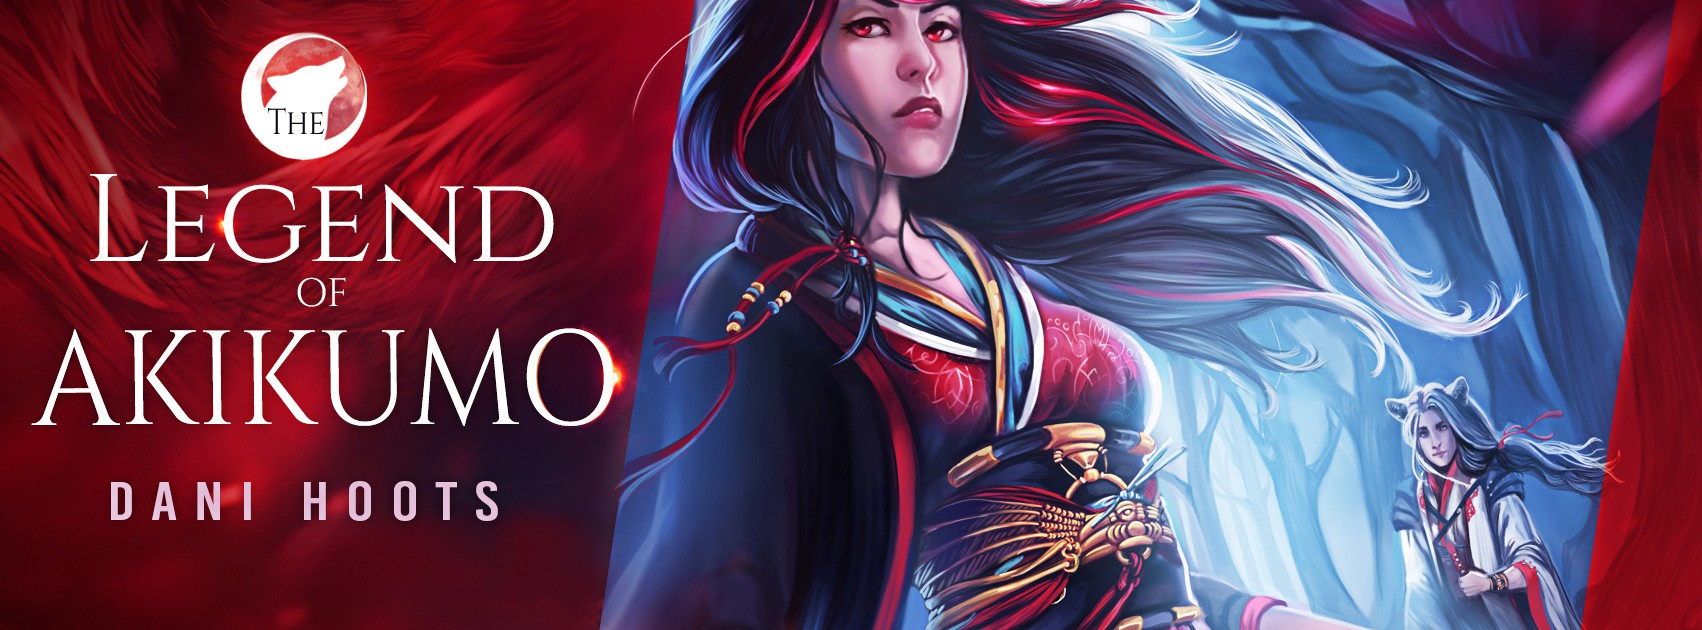 The Legend of Akikumo